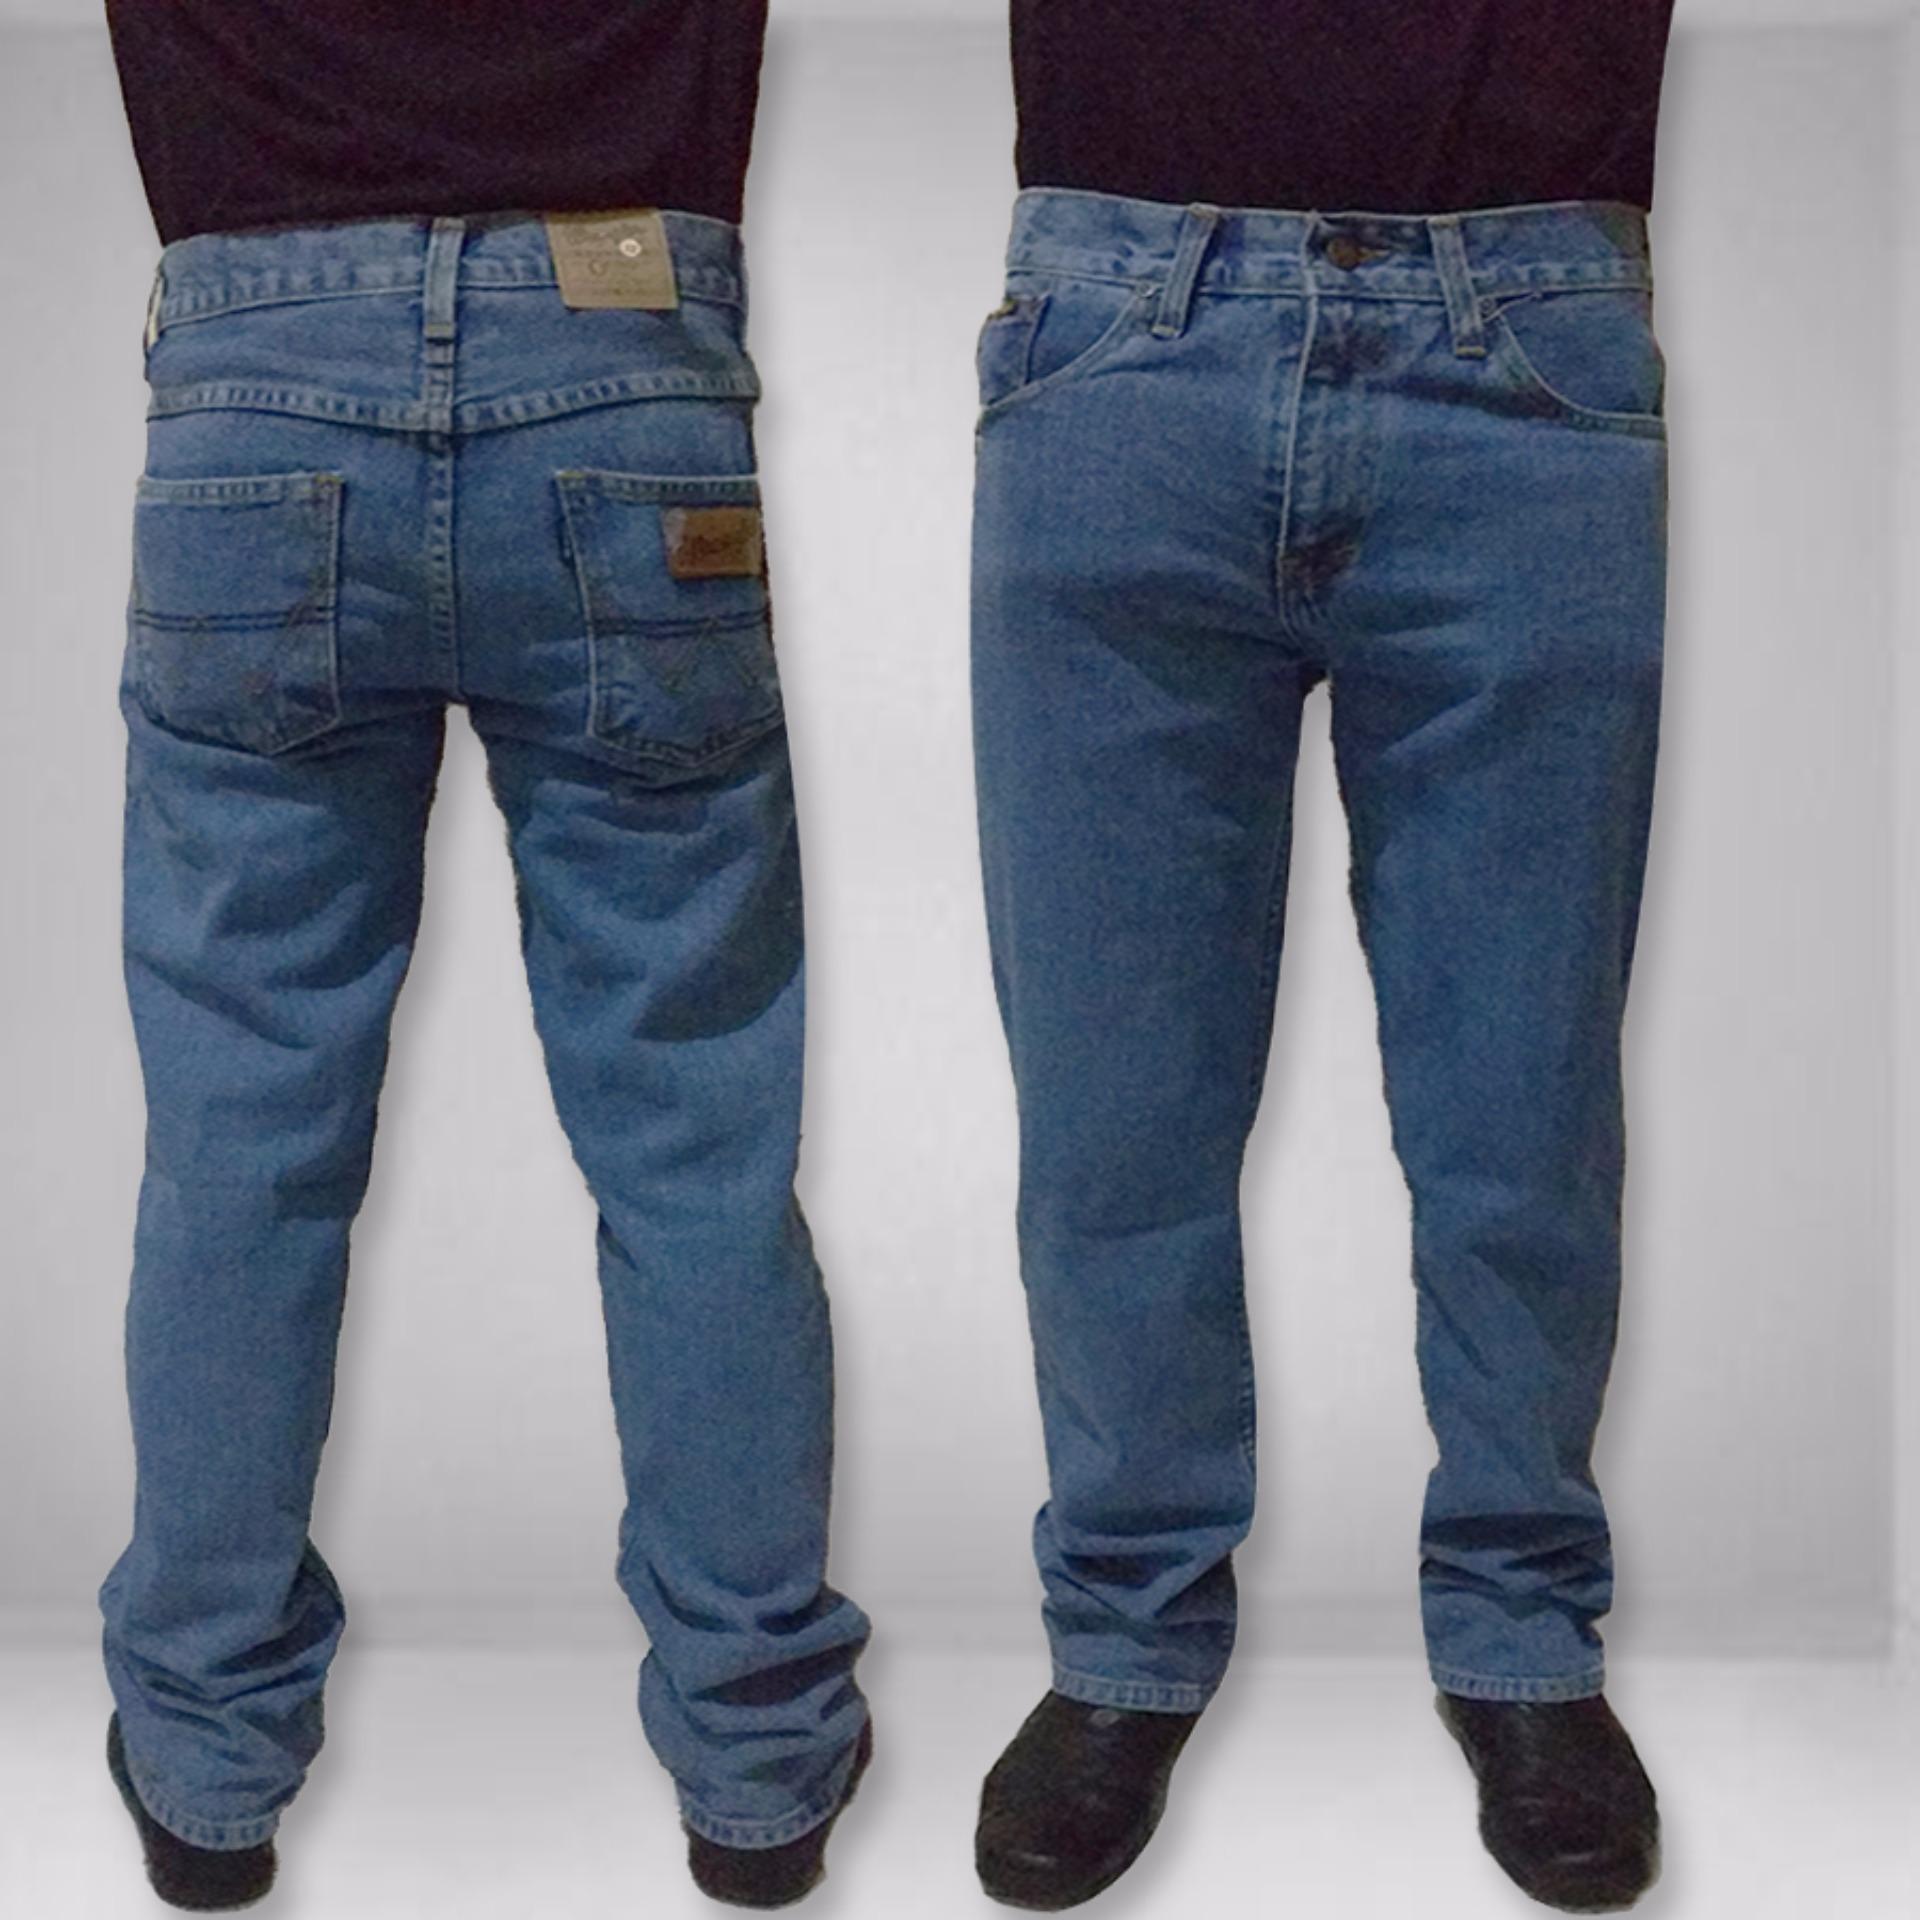 Jual Celana Jeans Wrangler Fit Standar Big Size S To Xxxl Jeans Wrangler